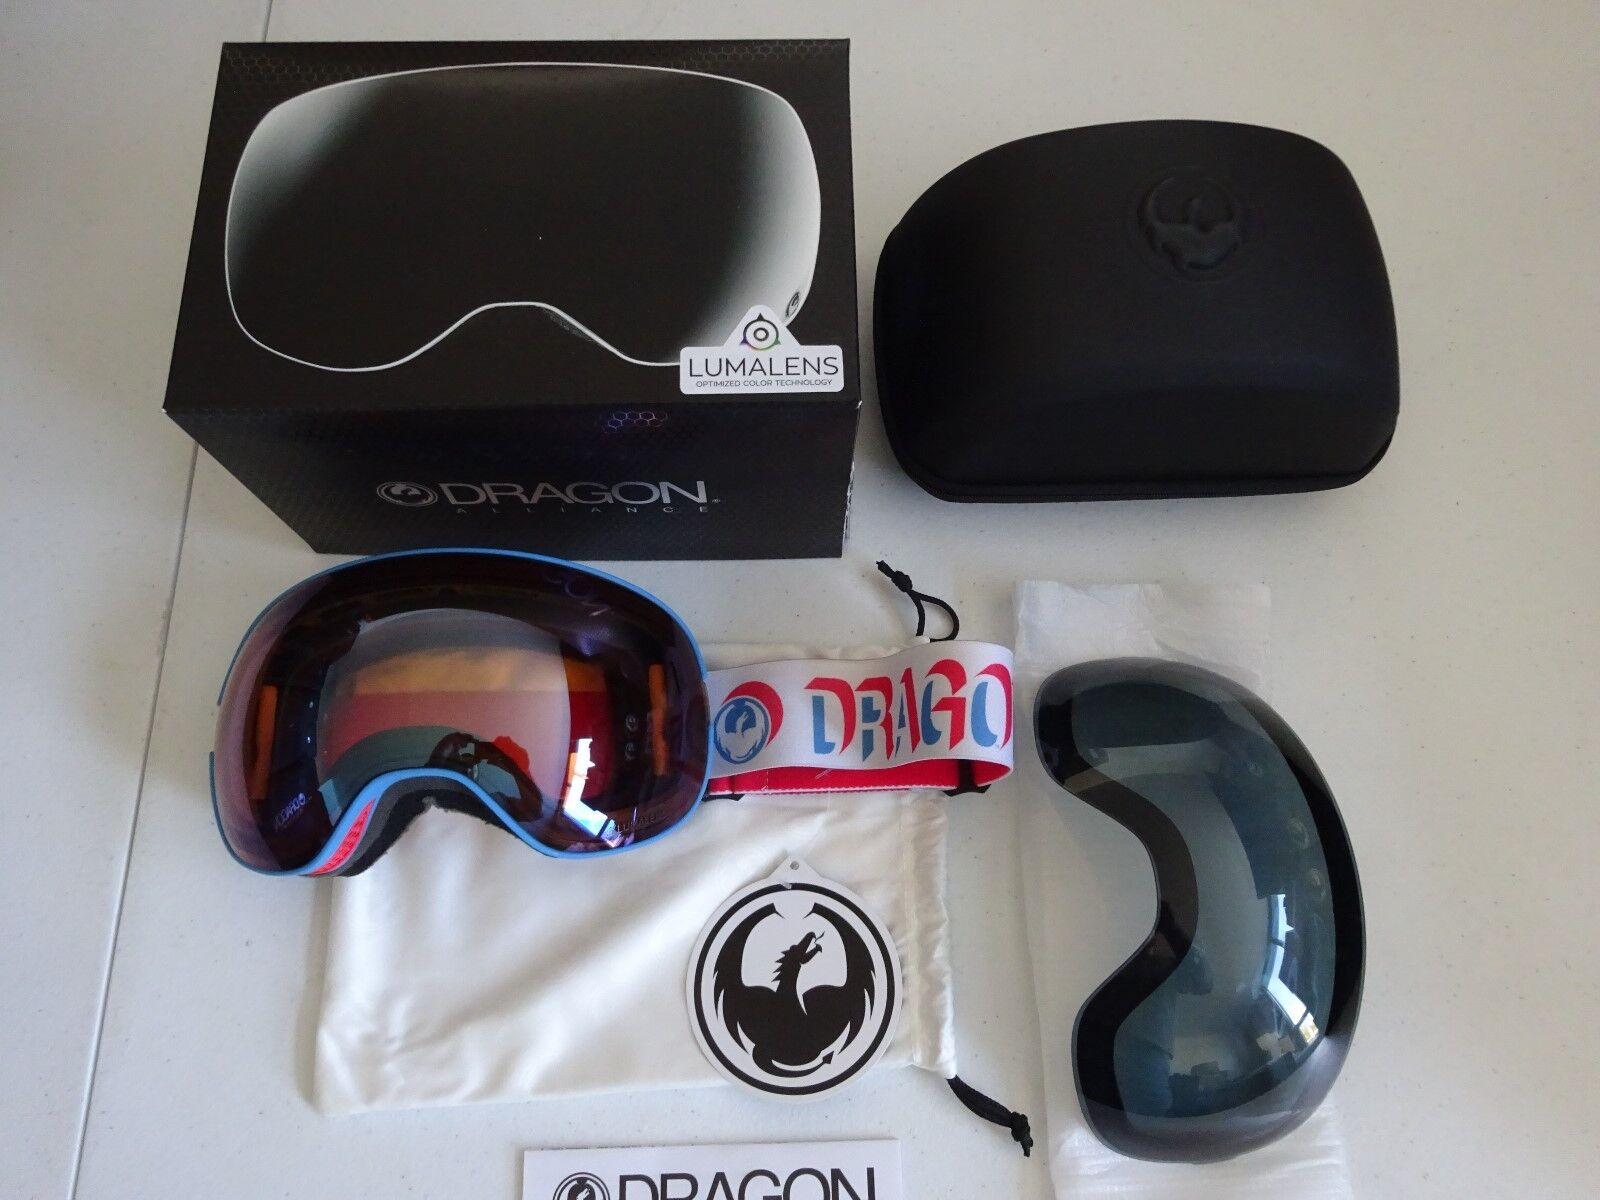 Dragon X2 Verge Lumalens Flash bluee + Dark Smoke Snow Goggle NIB NEW 2017